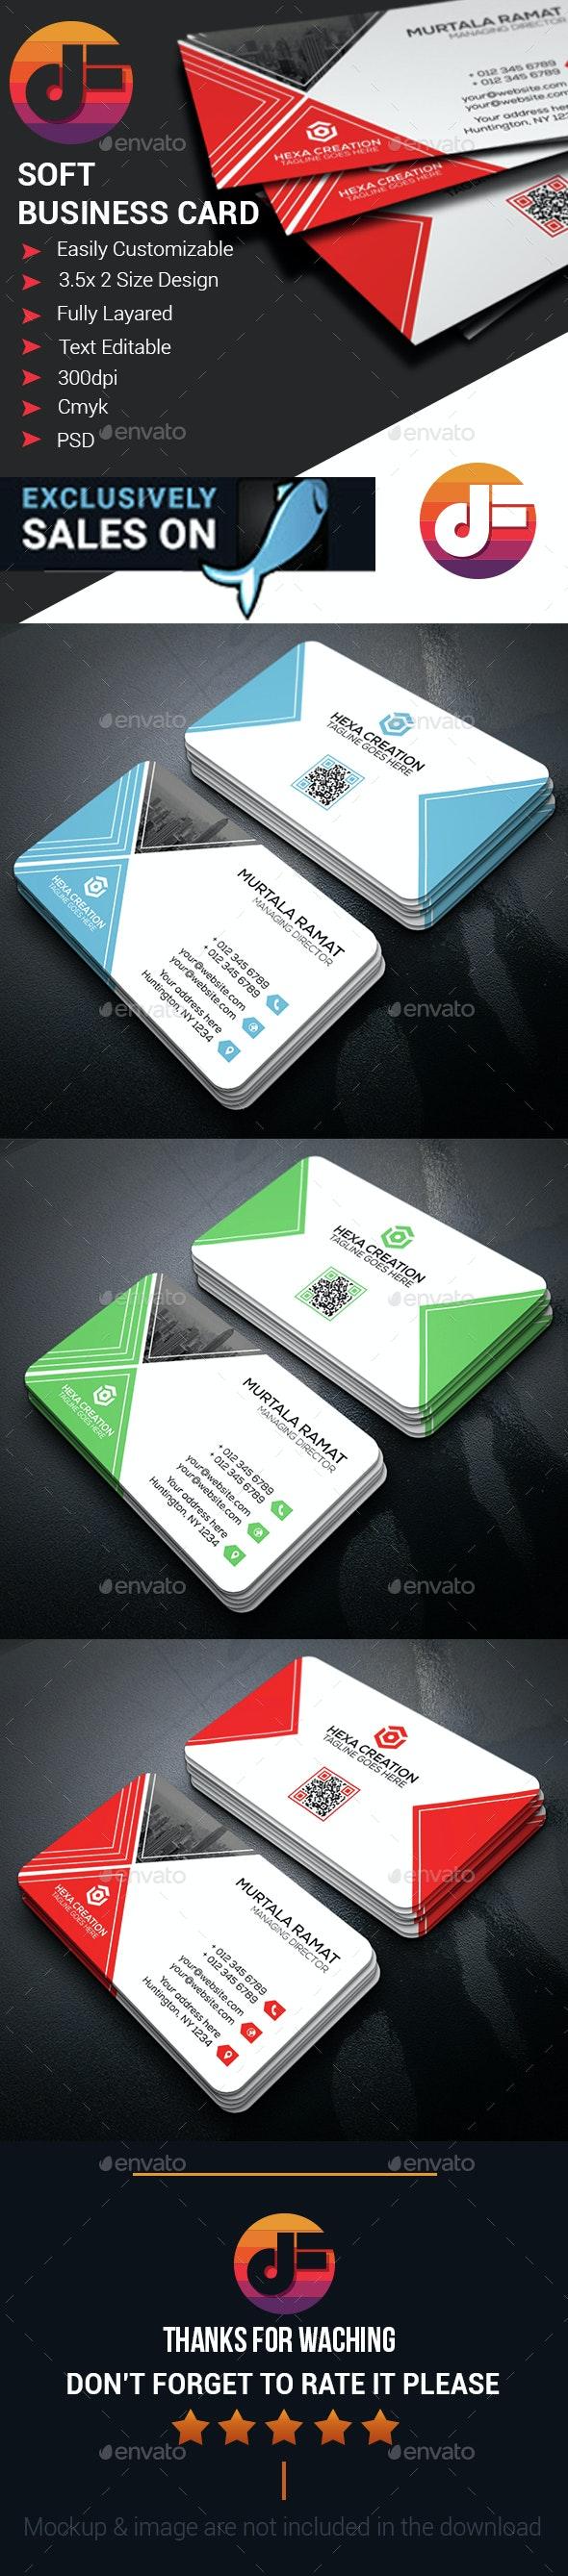 Business Card Design - Corporate Business Cards